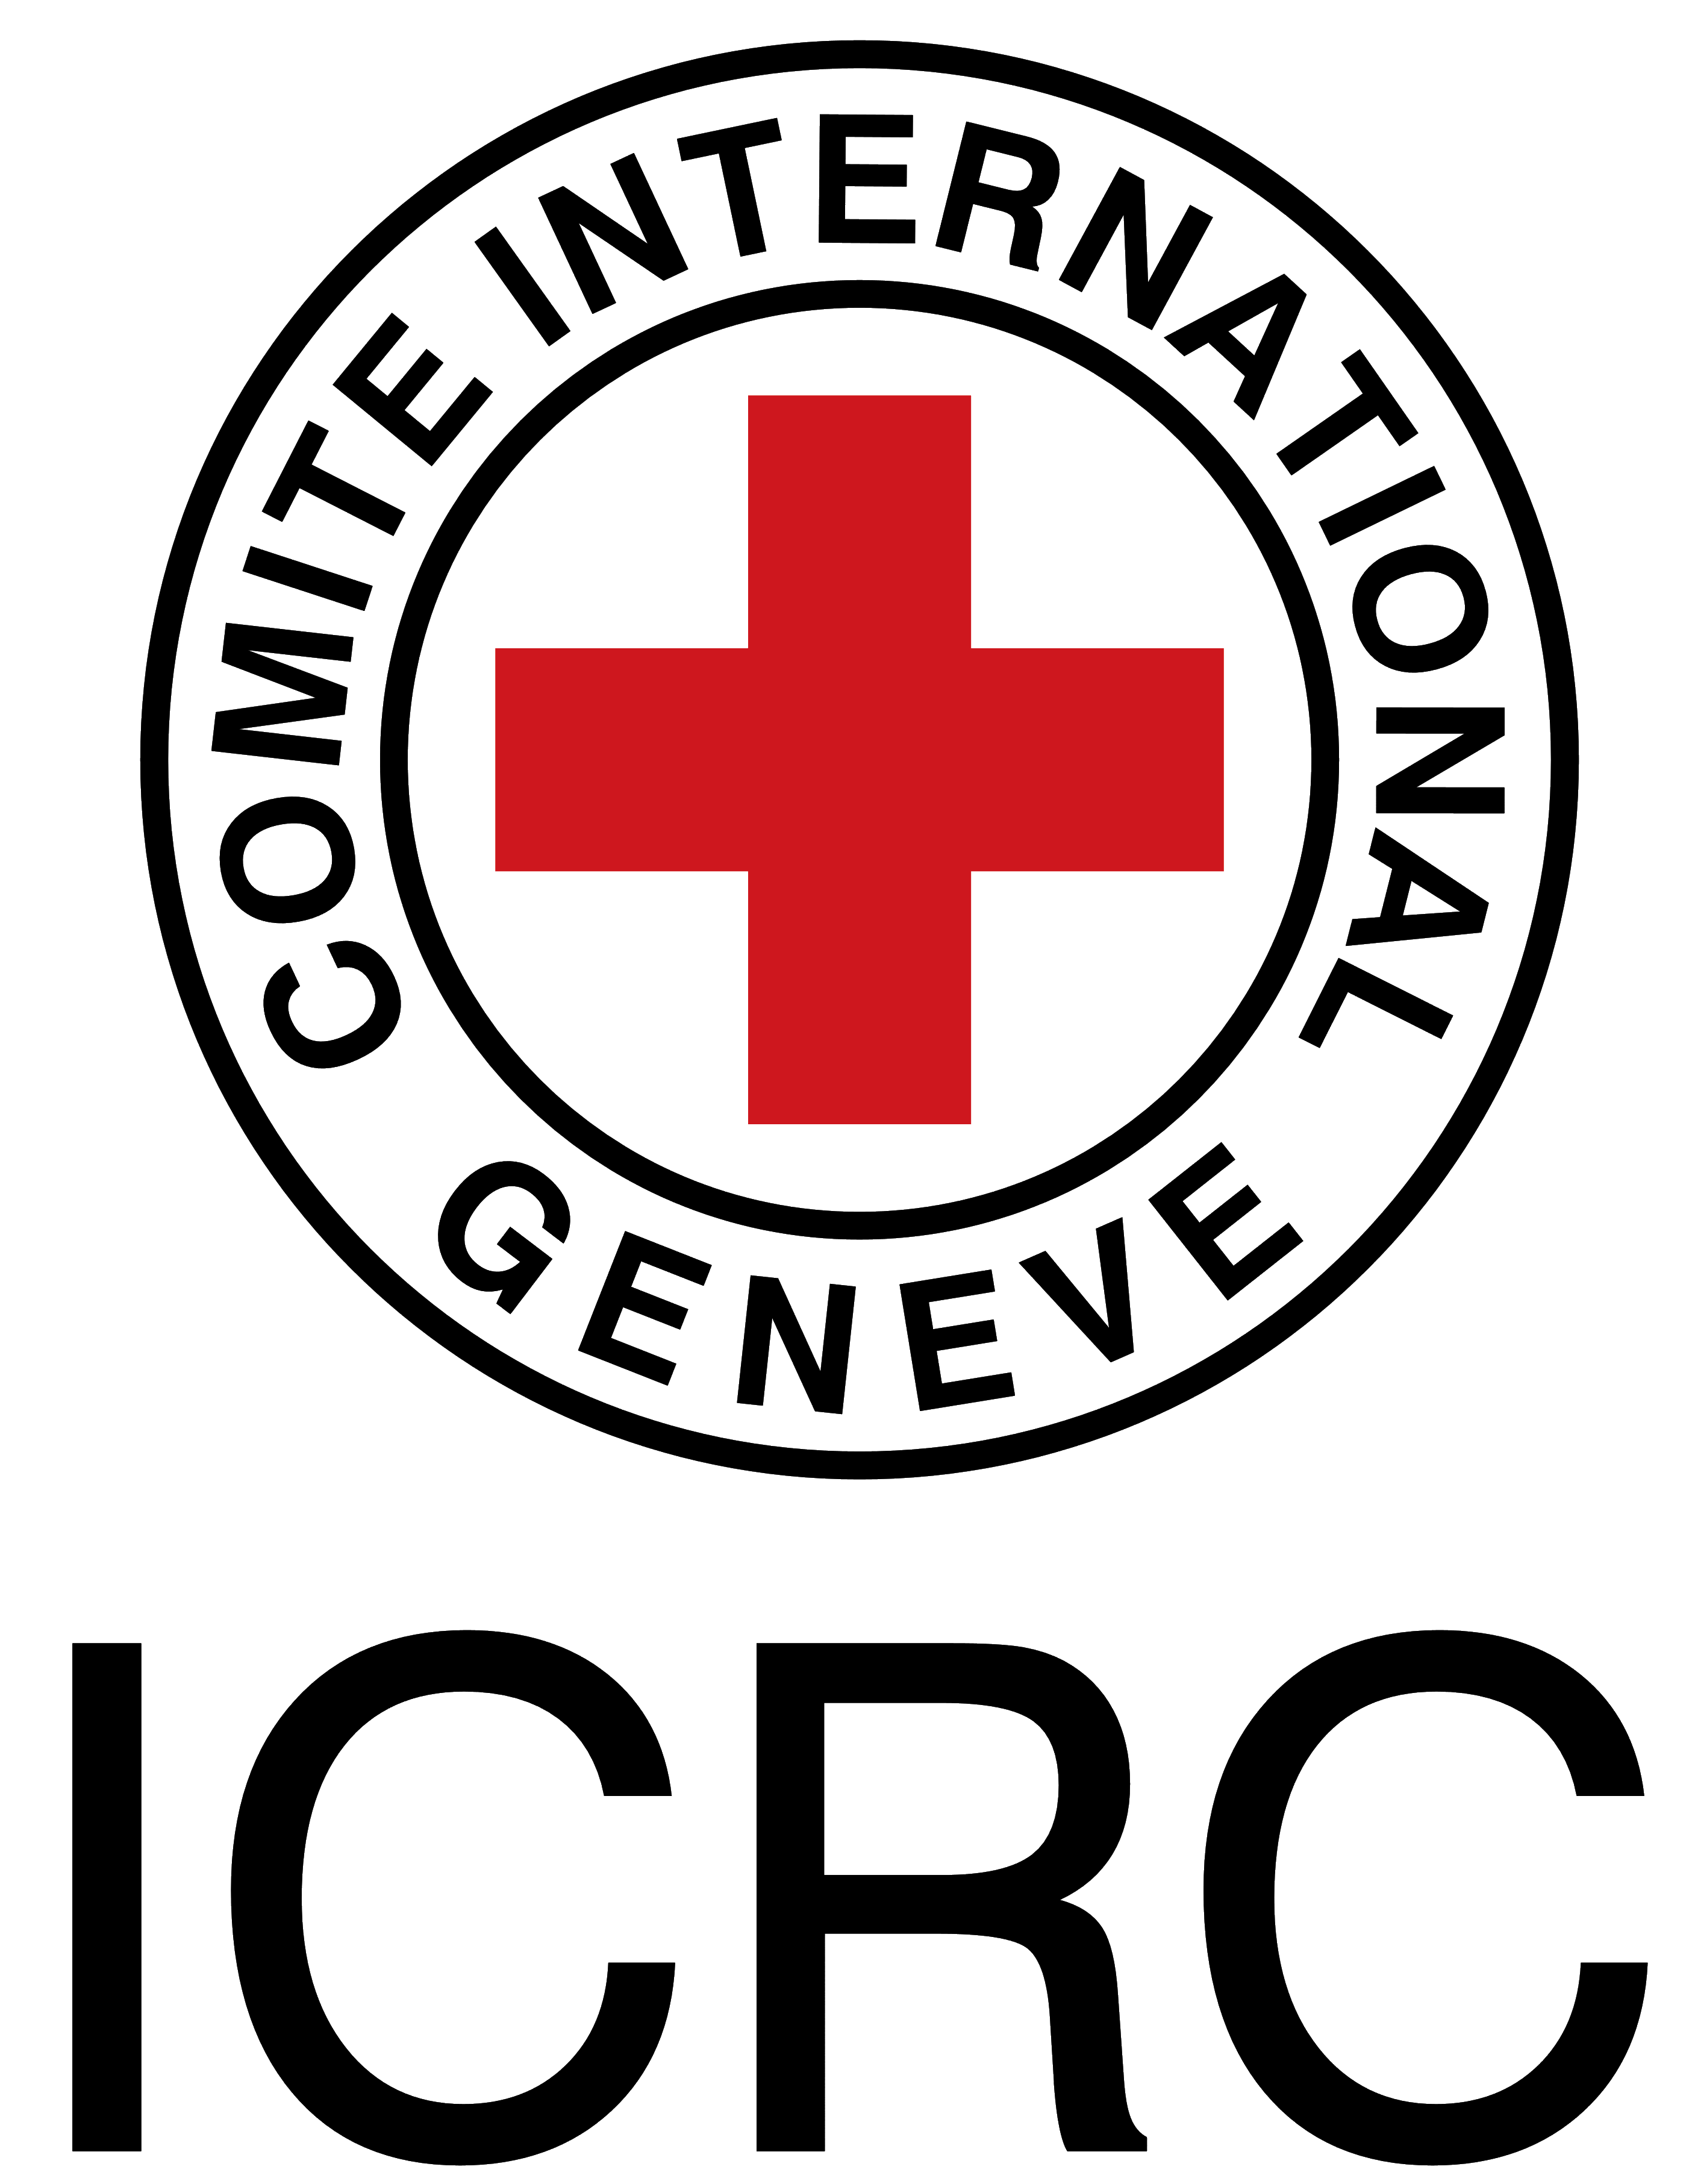 International Committee of Red Cross